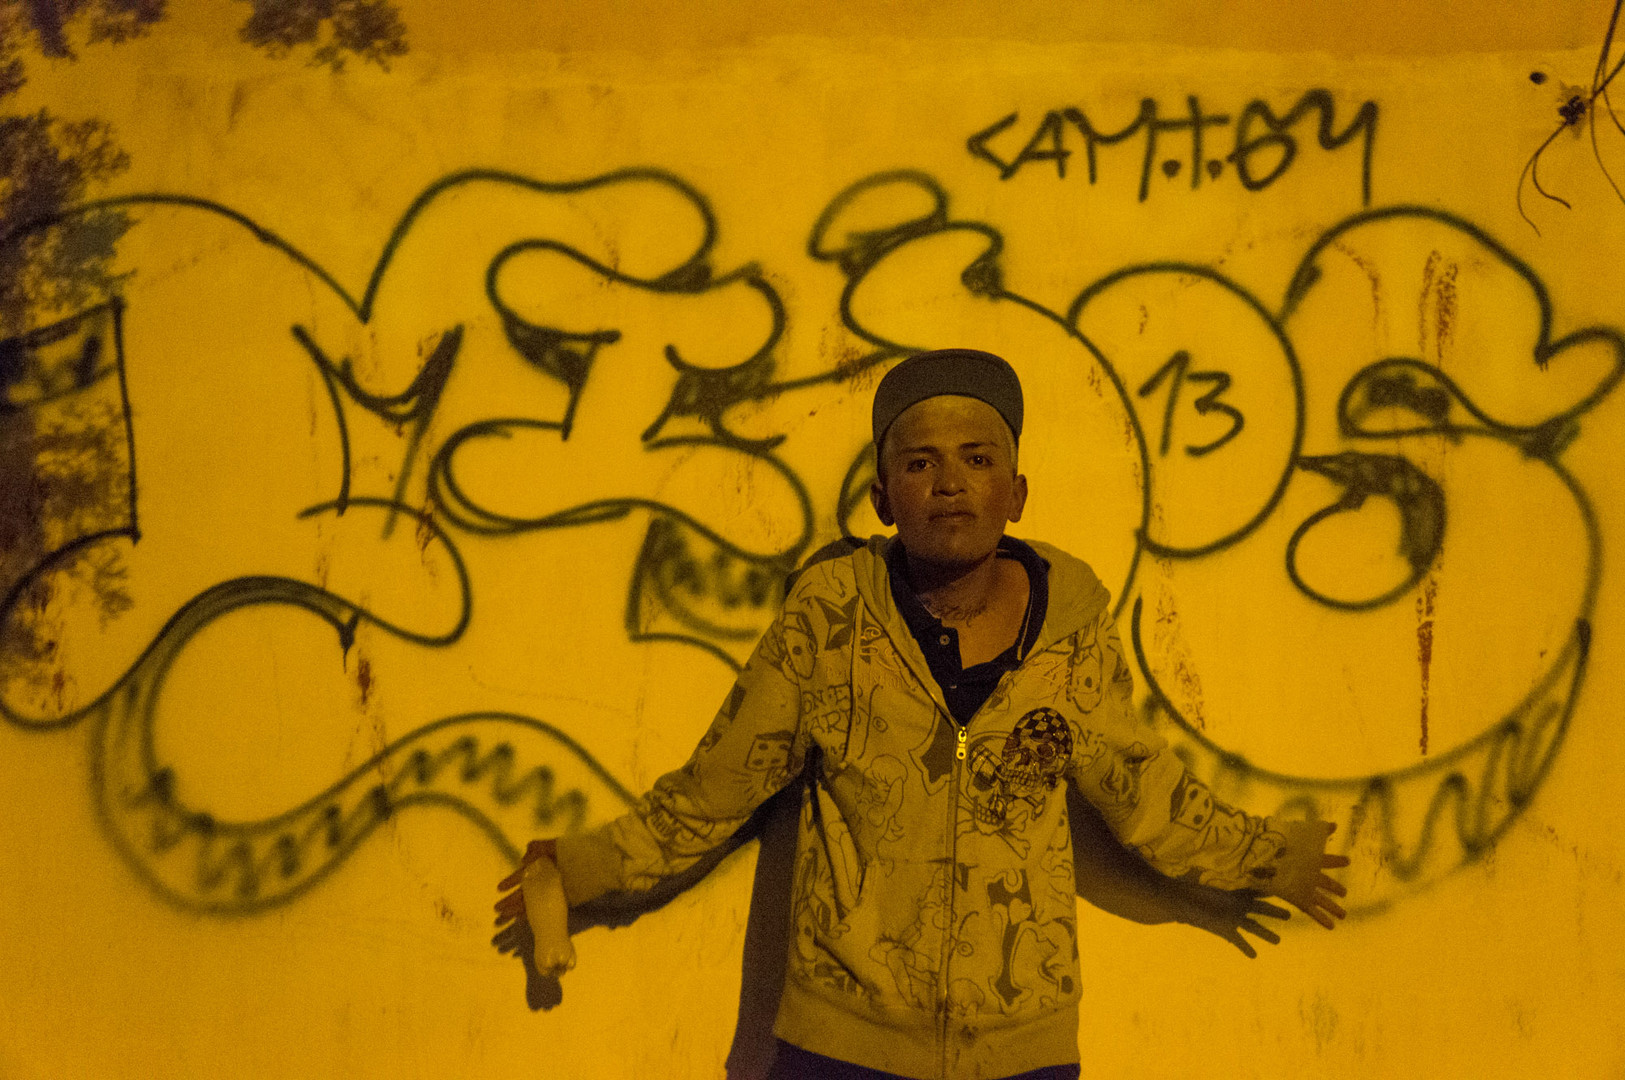 JFF_Hecho-en-Barrio-17.jpg